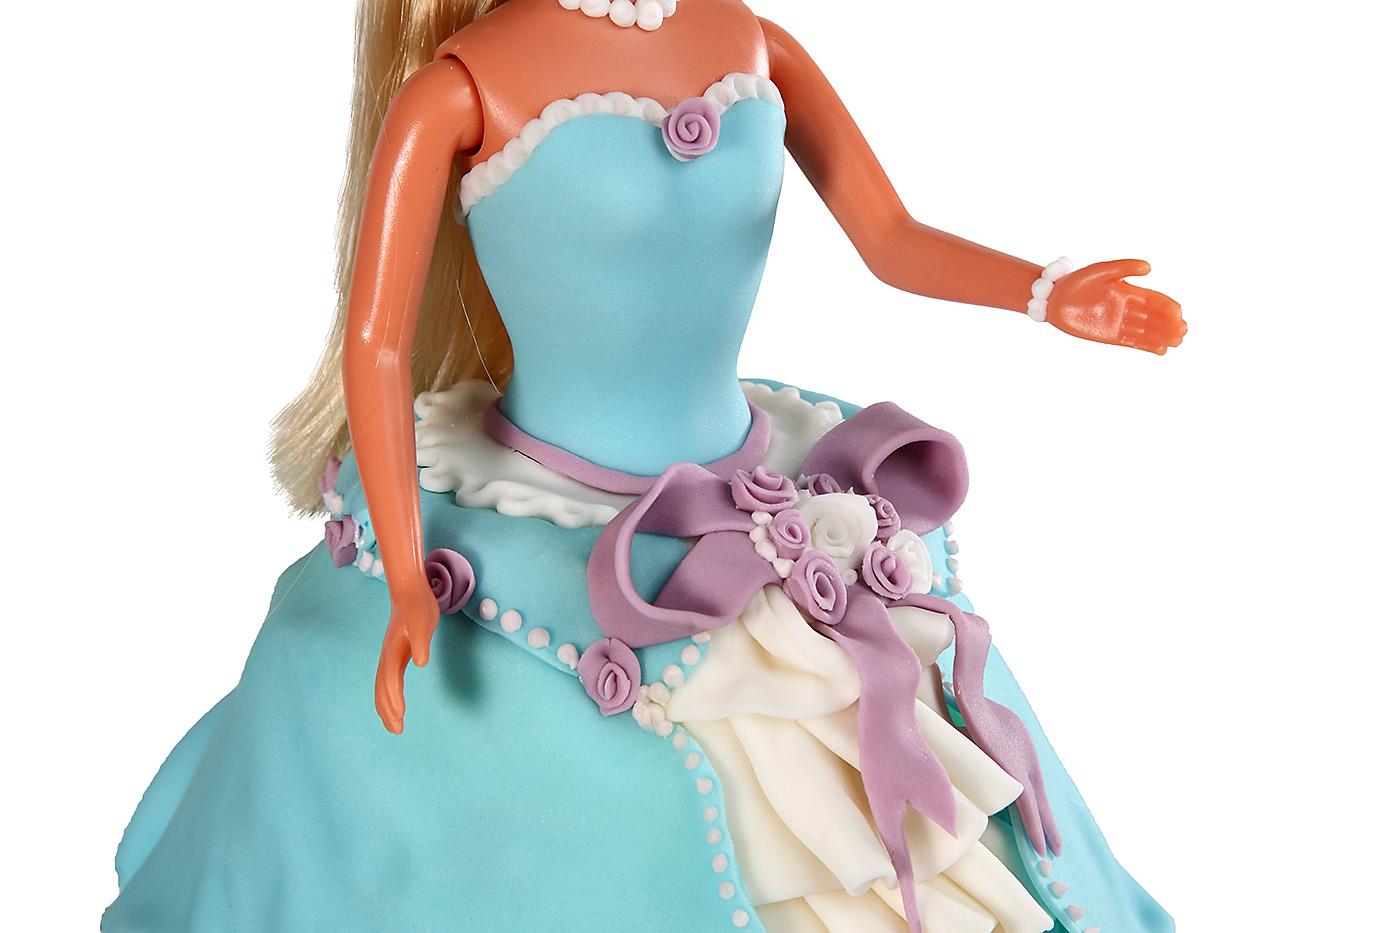 Torte_Prinzessin_Detail_1400px.jpg